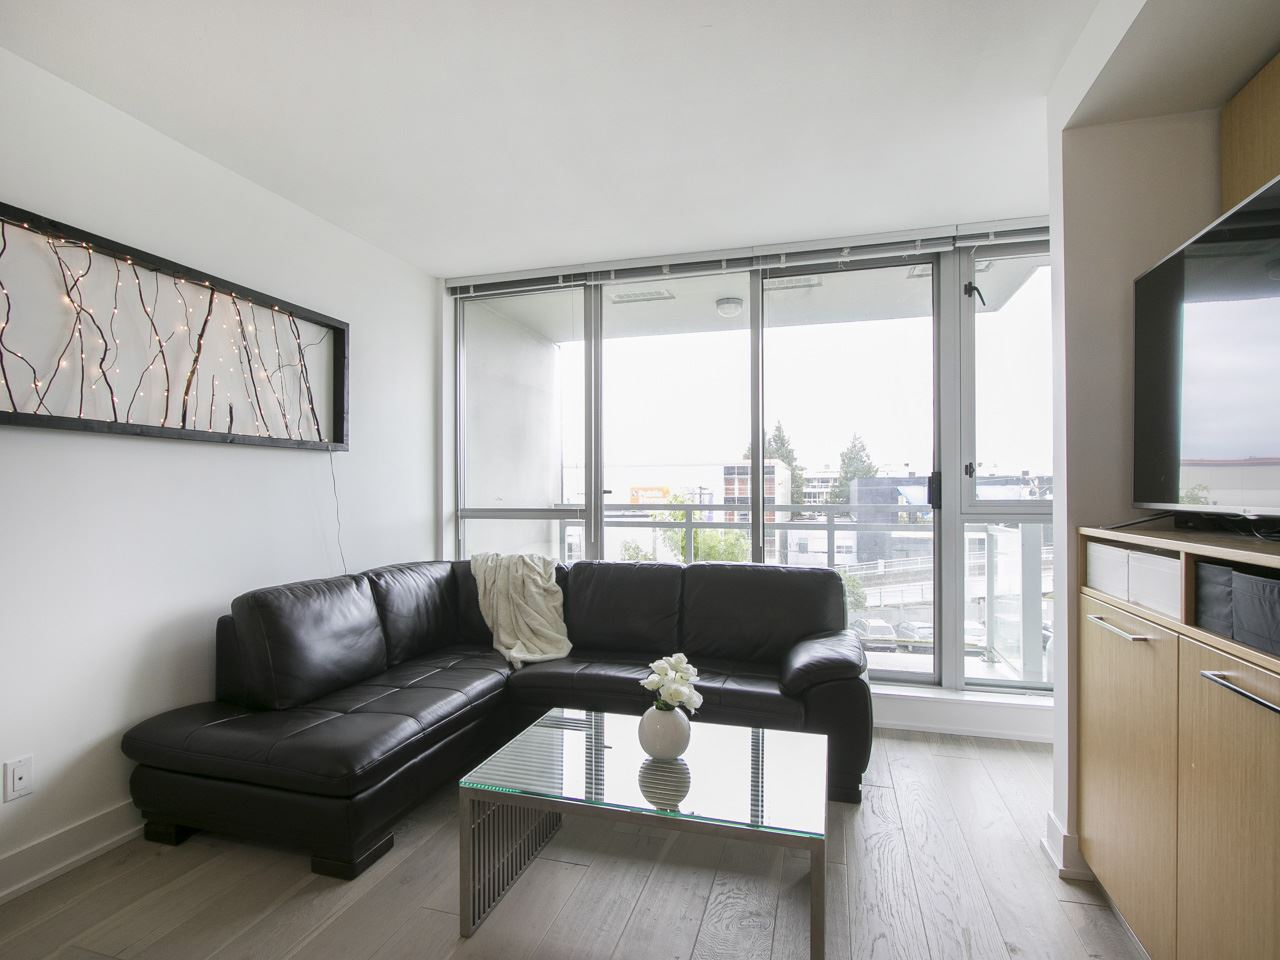 Condo Apartment at 310 1680 W 4TH AVENUE, Unit 310, Vancouver West, British Columbia. Image 4